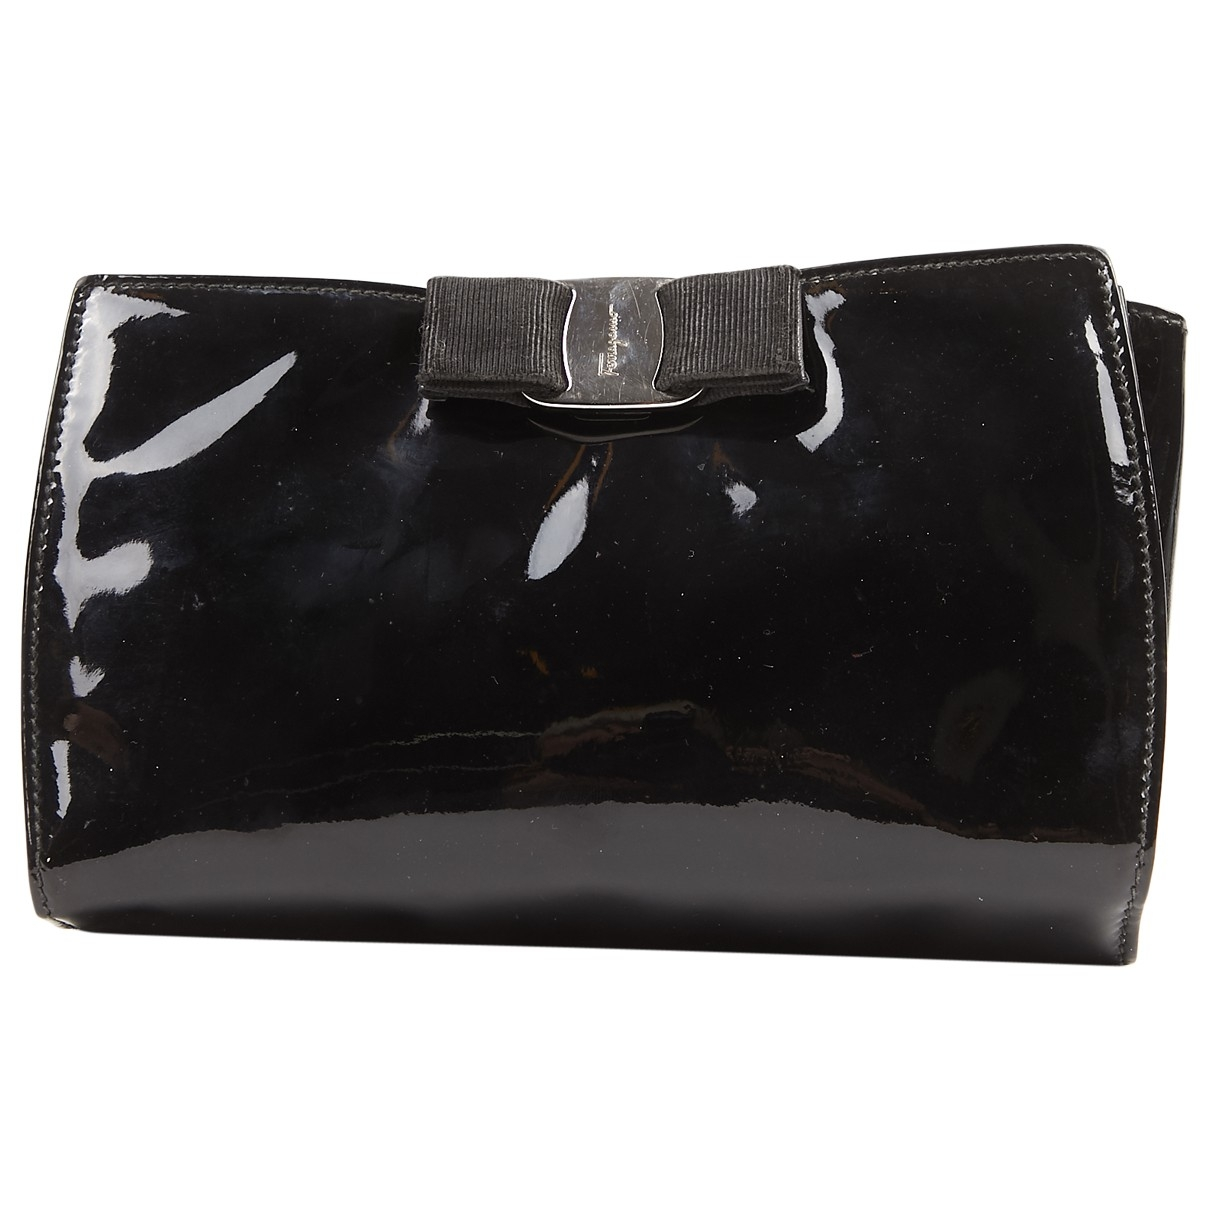 Salvatore Ferragamo \N Black Patent leather Clutch bag for Women \N